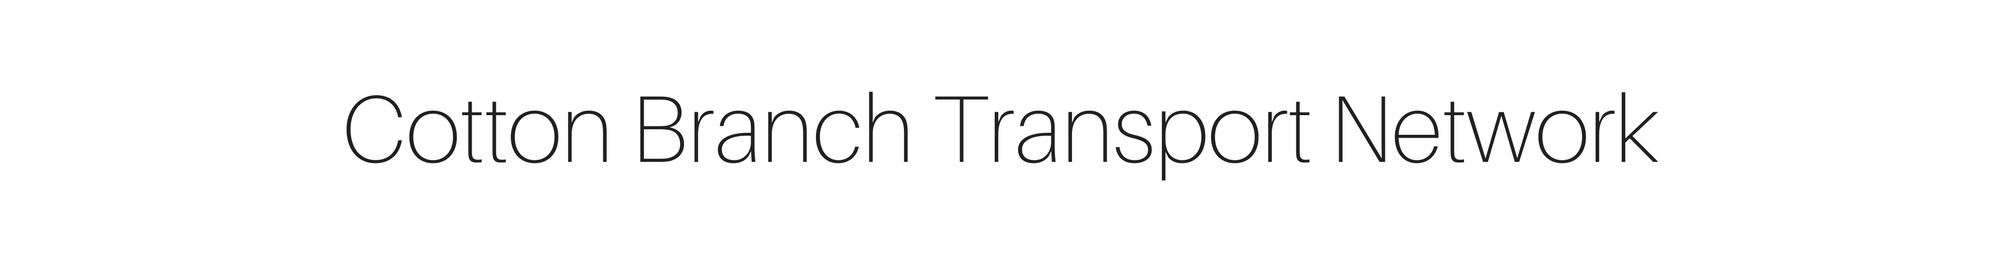 Transport_Network.png